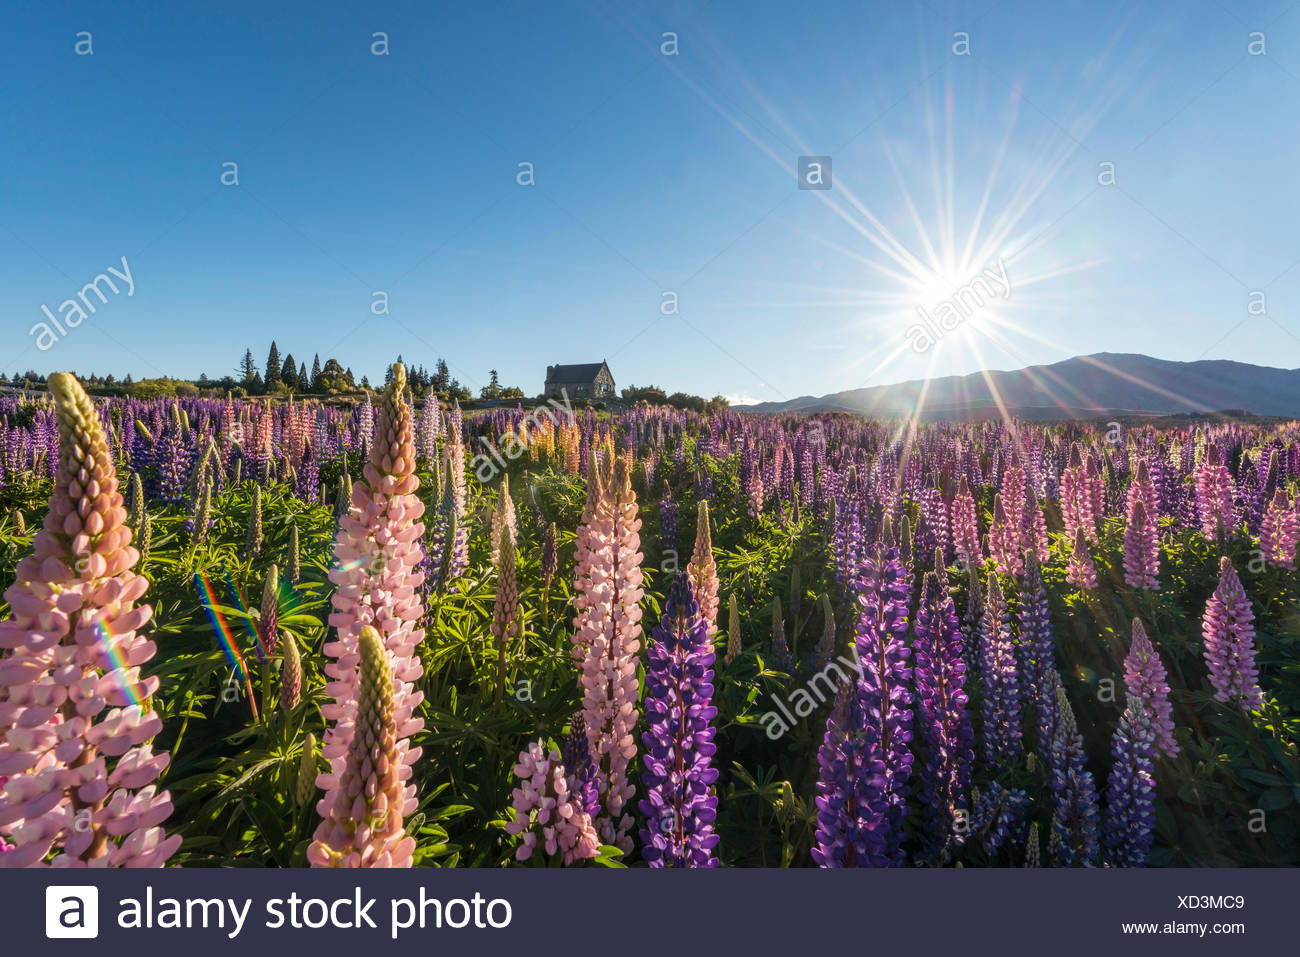 Sun shining through purple Large-leaved lupines (Lupinus polyphyllus), sunstern, Church of the Good Shepherd, Lake Tekapo - Stock Image